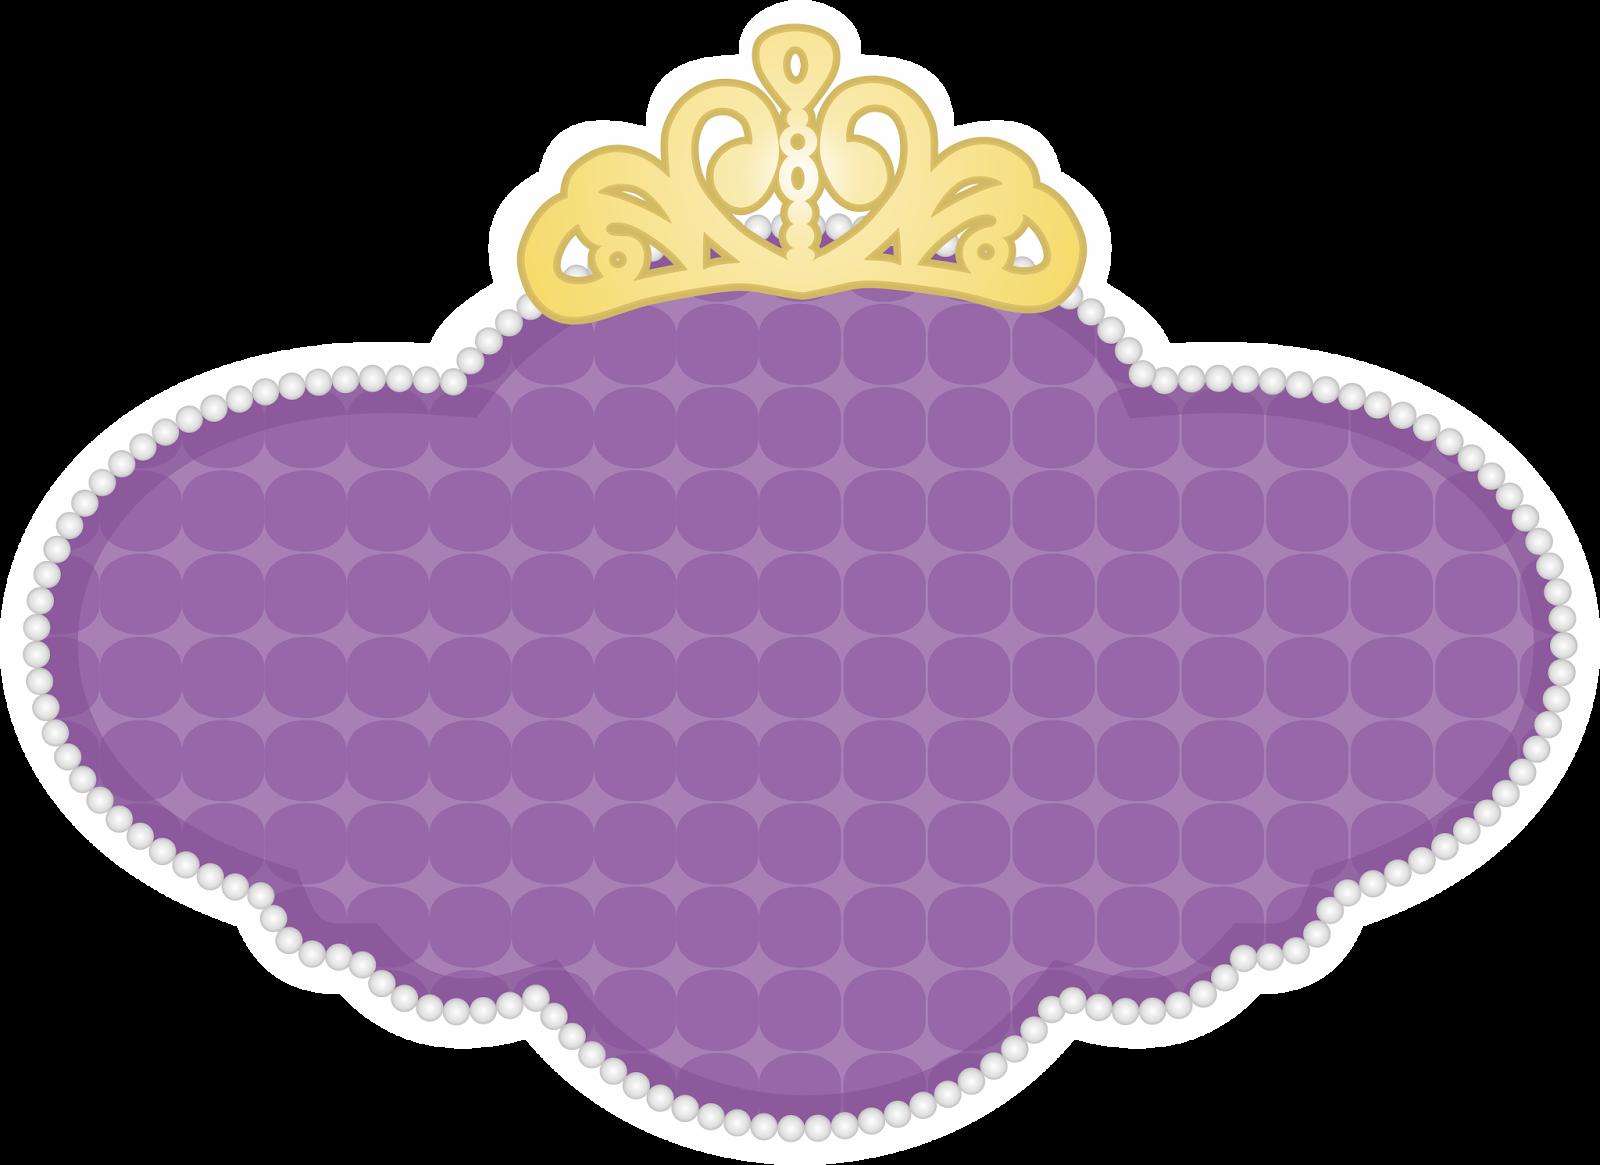 Sofia the first crown clipart jpg free Pin by Carolina on fg   Pinterest   Birthdays jpg free